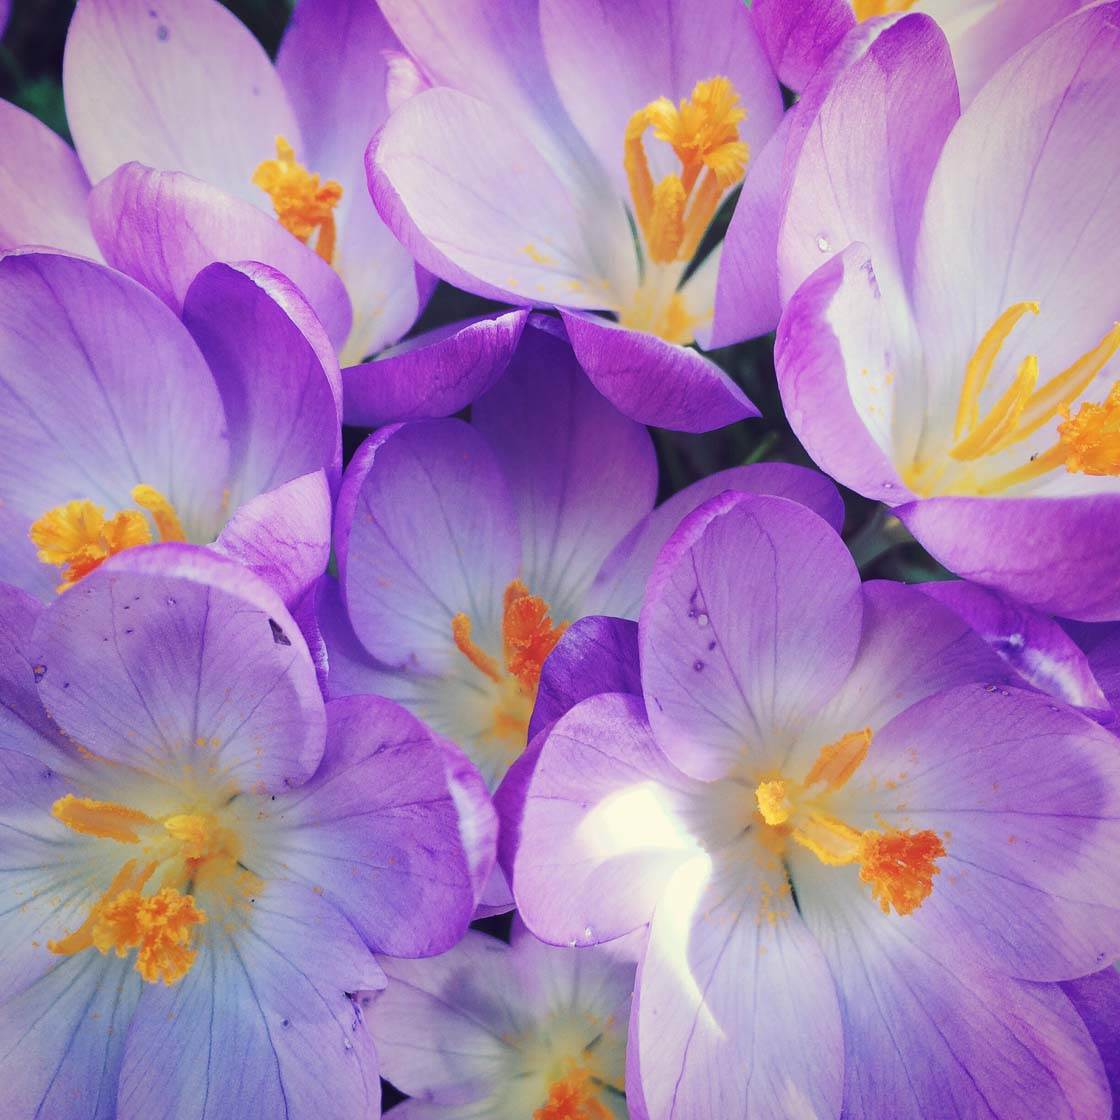 iPhone Flower Photography 4 no script